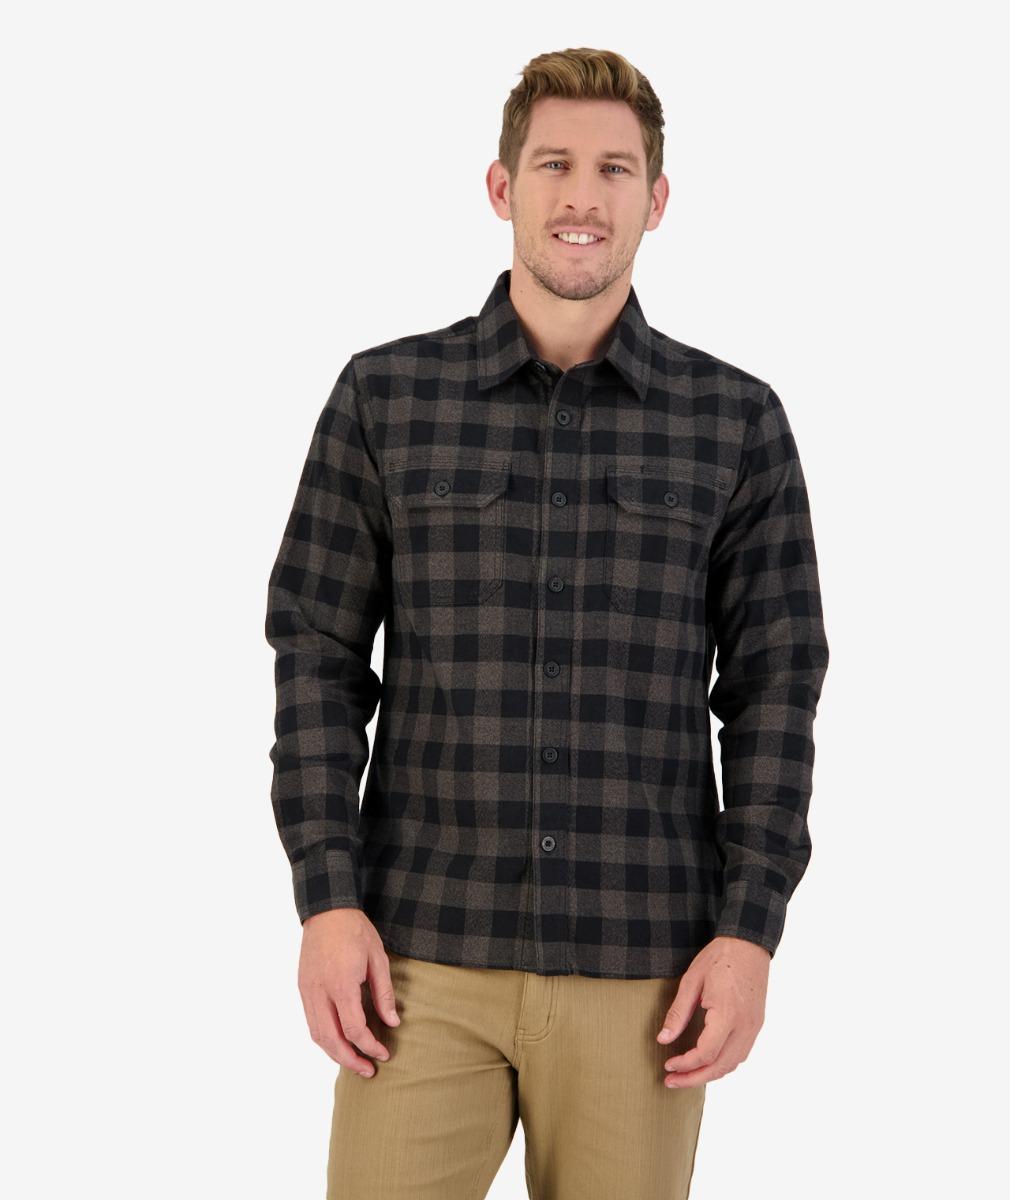 Taranaki Tailor L/S Work Shirt in Charcoal/Black